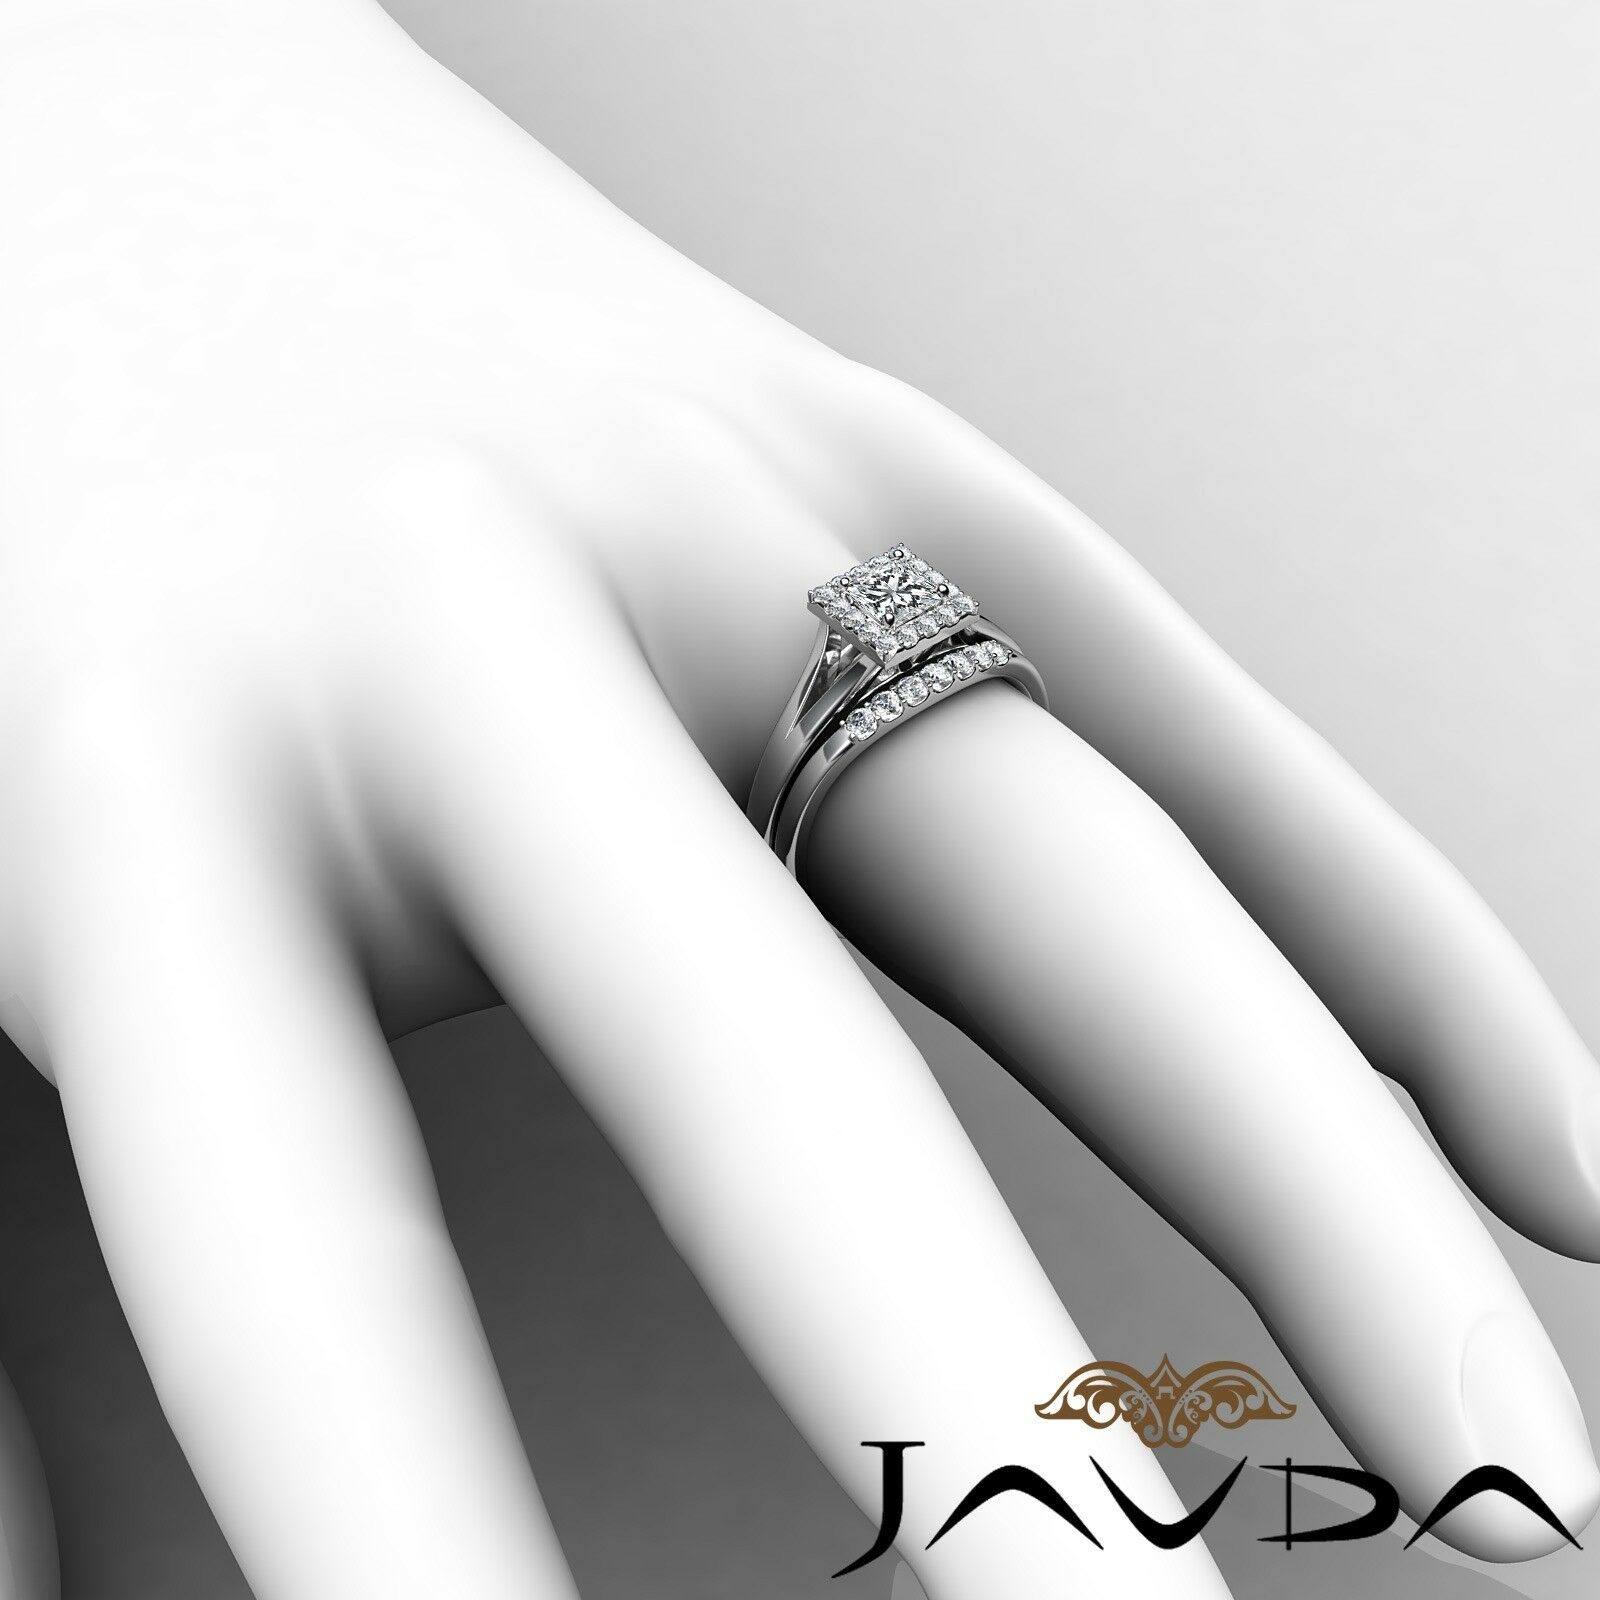 0.93ctw Halo Pave Bridal Princess Diamond Engagement Ring GIA F-VVS1 White Gold 6